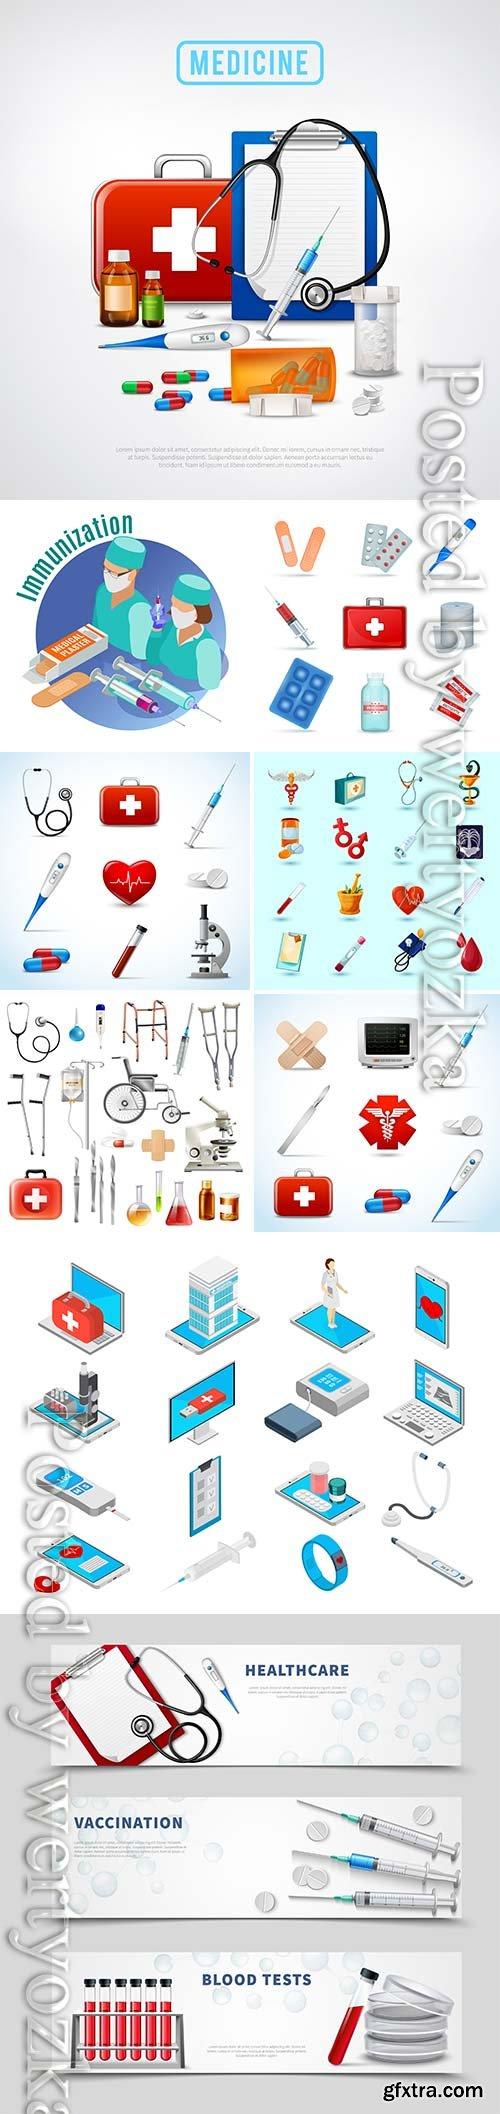 Medicine isometric concept with medical equipment symbols vector illustration